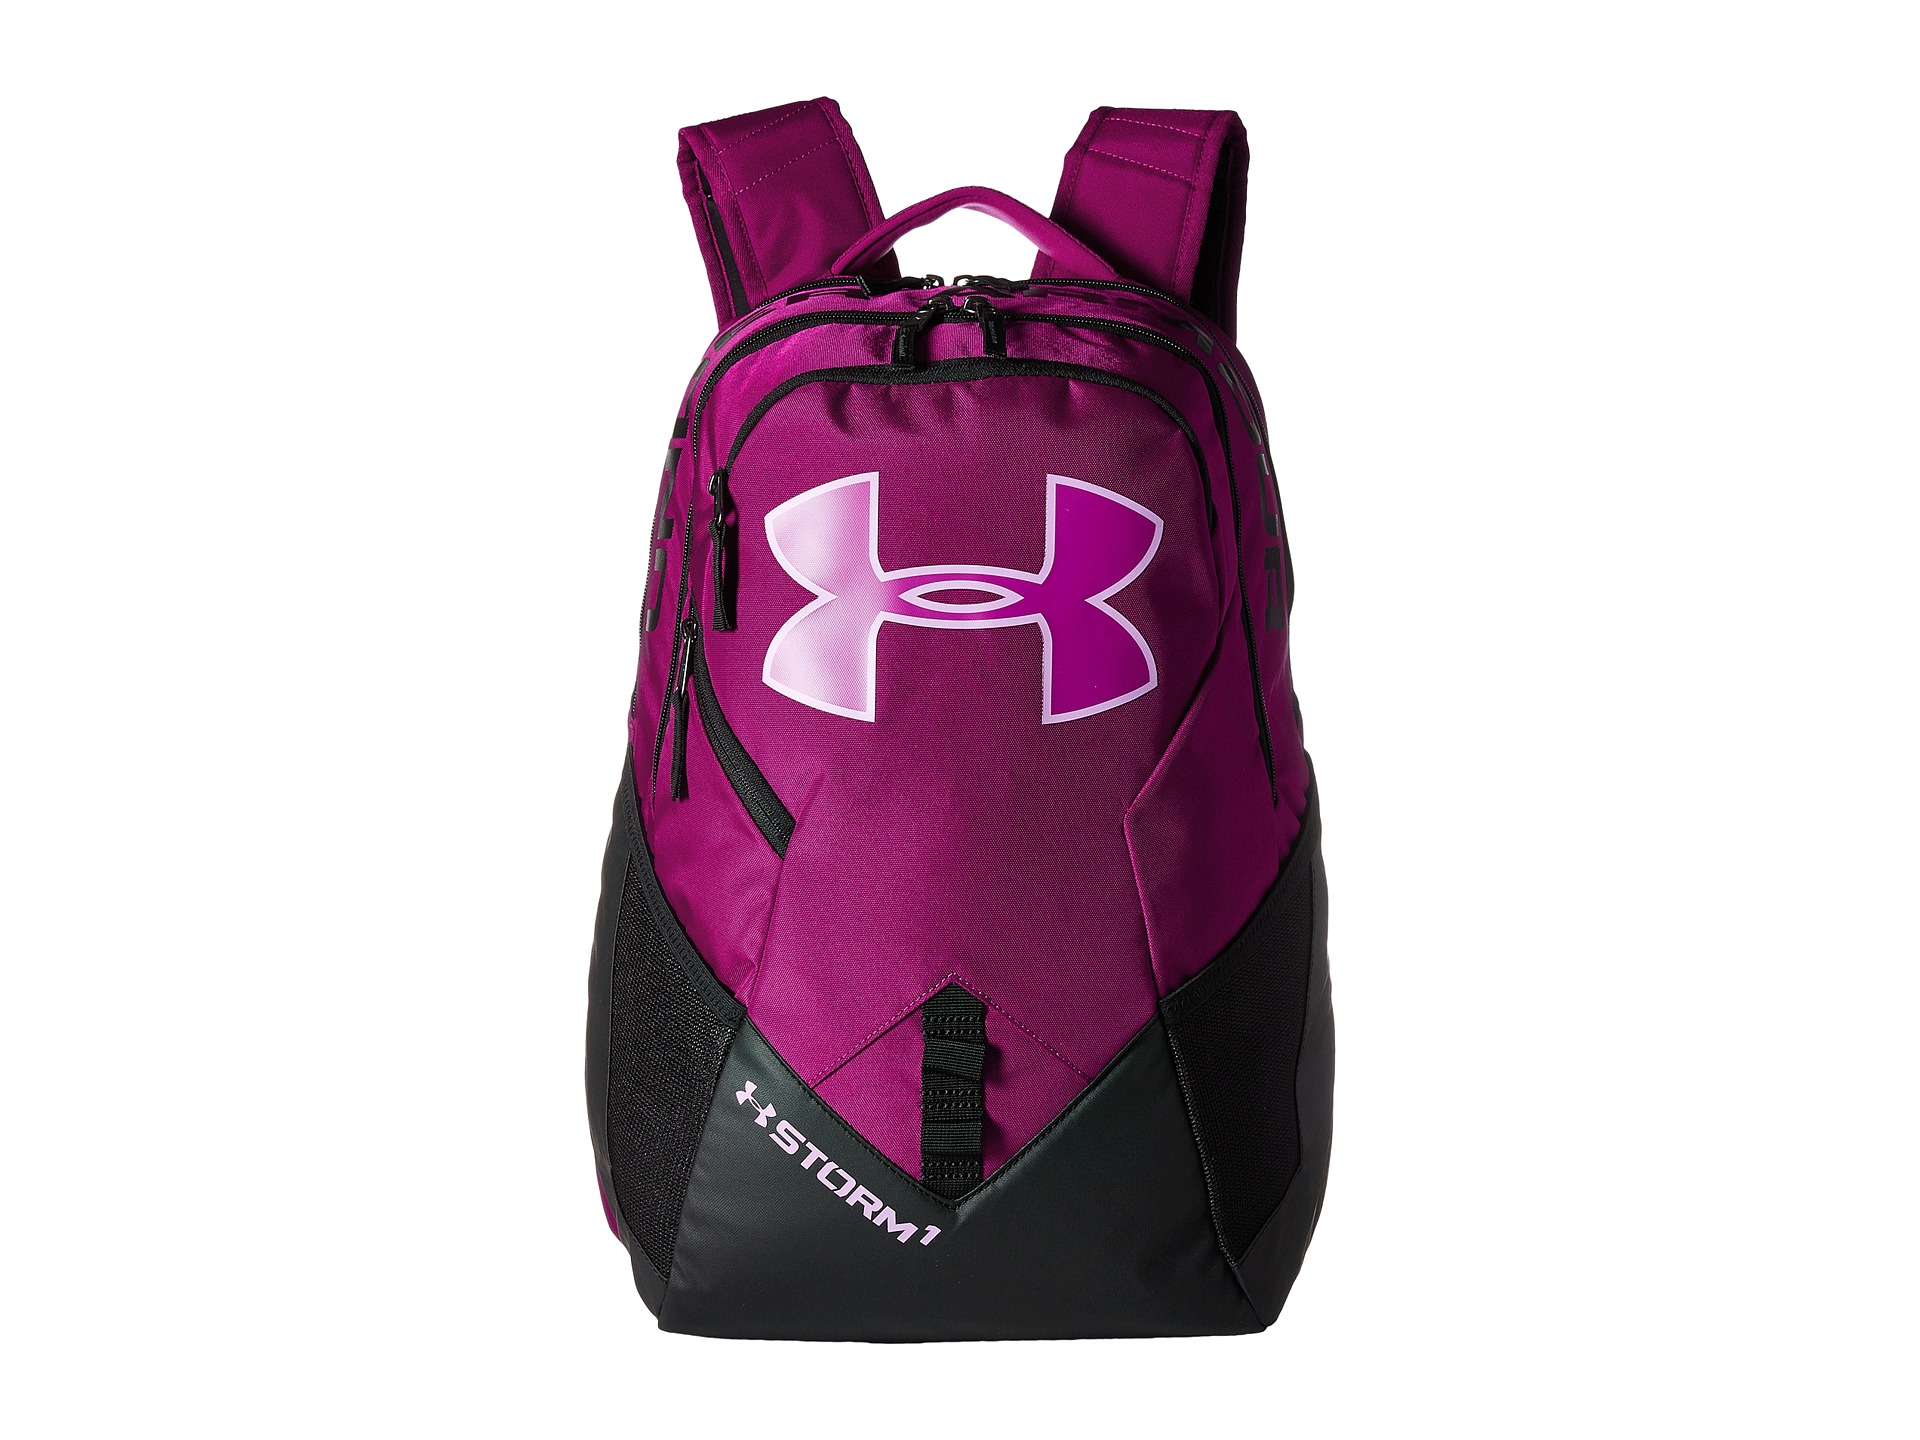 b3a0daa889 Under Armour Purple Ua Big Logo Iv Backpack for men